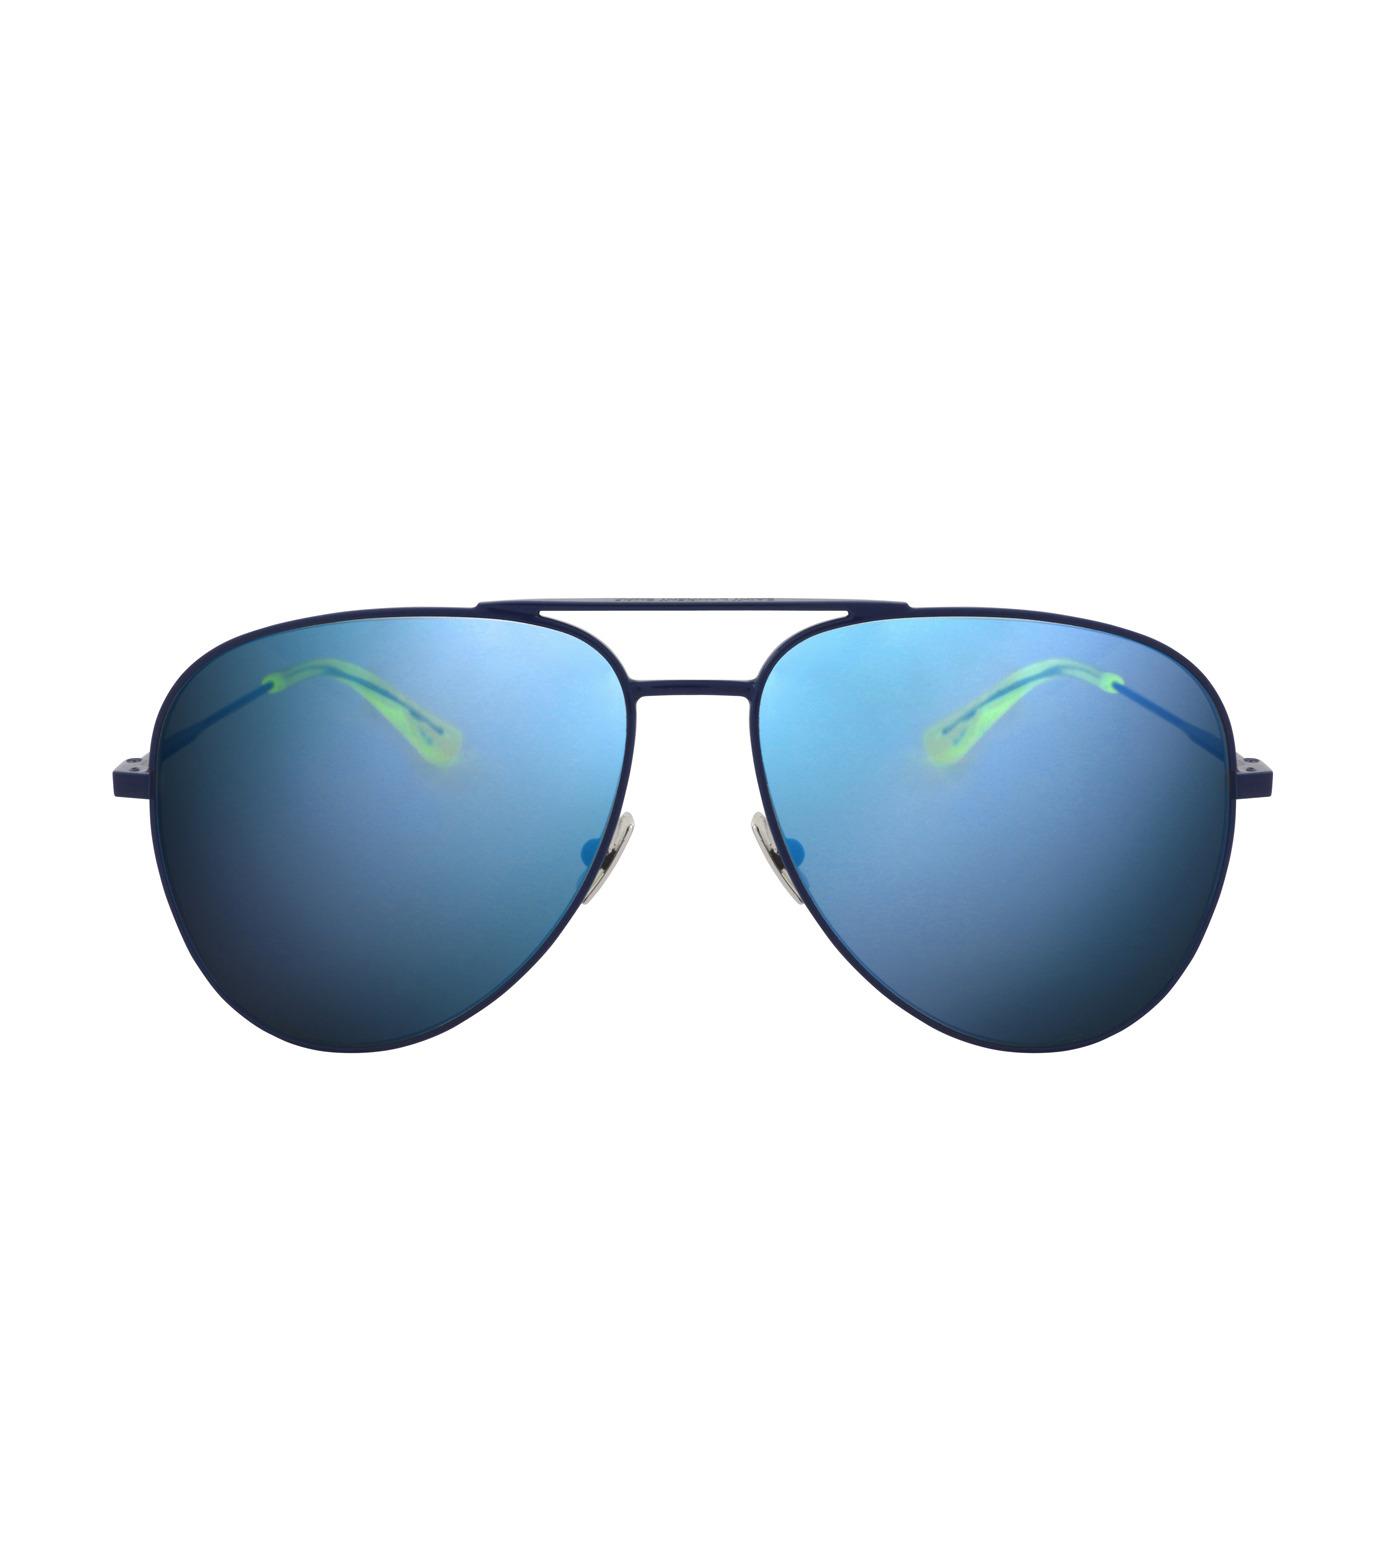 SAINT LAURENT(サンローラン)のTeardrop-BLUE(アイウェア/eyewear)-427758-Y9902-92 拡大詳細画像3